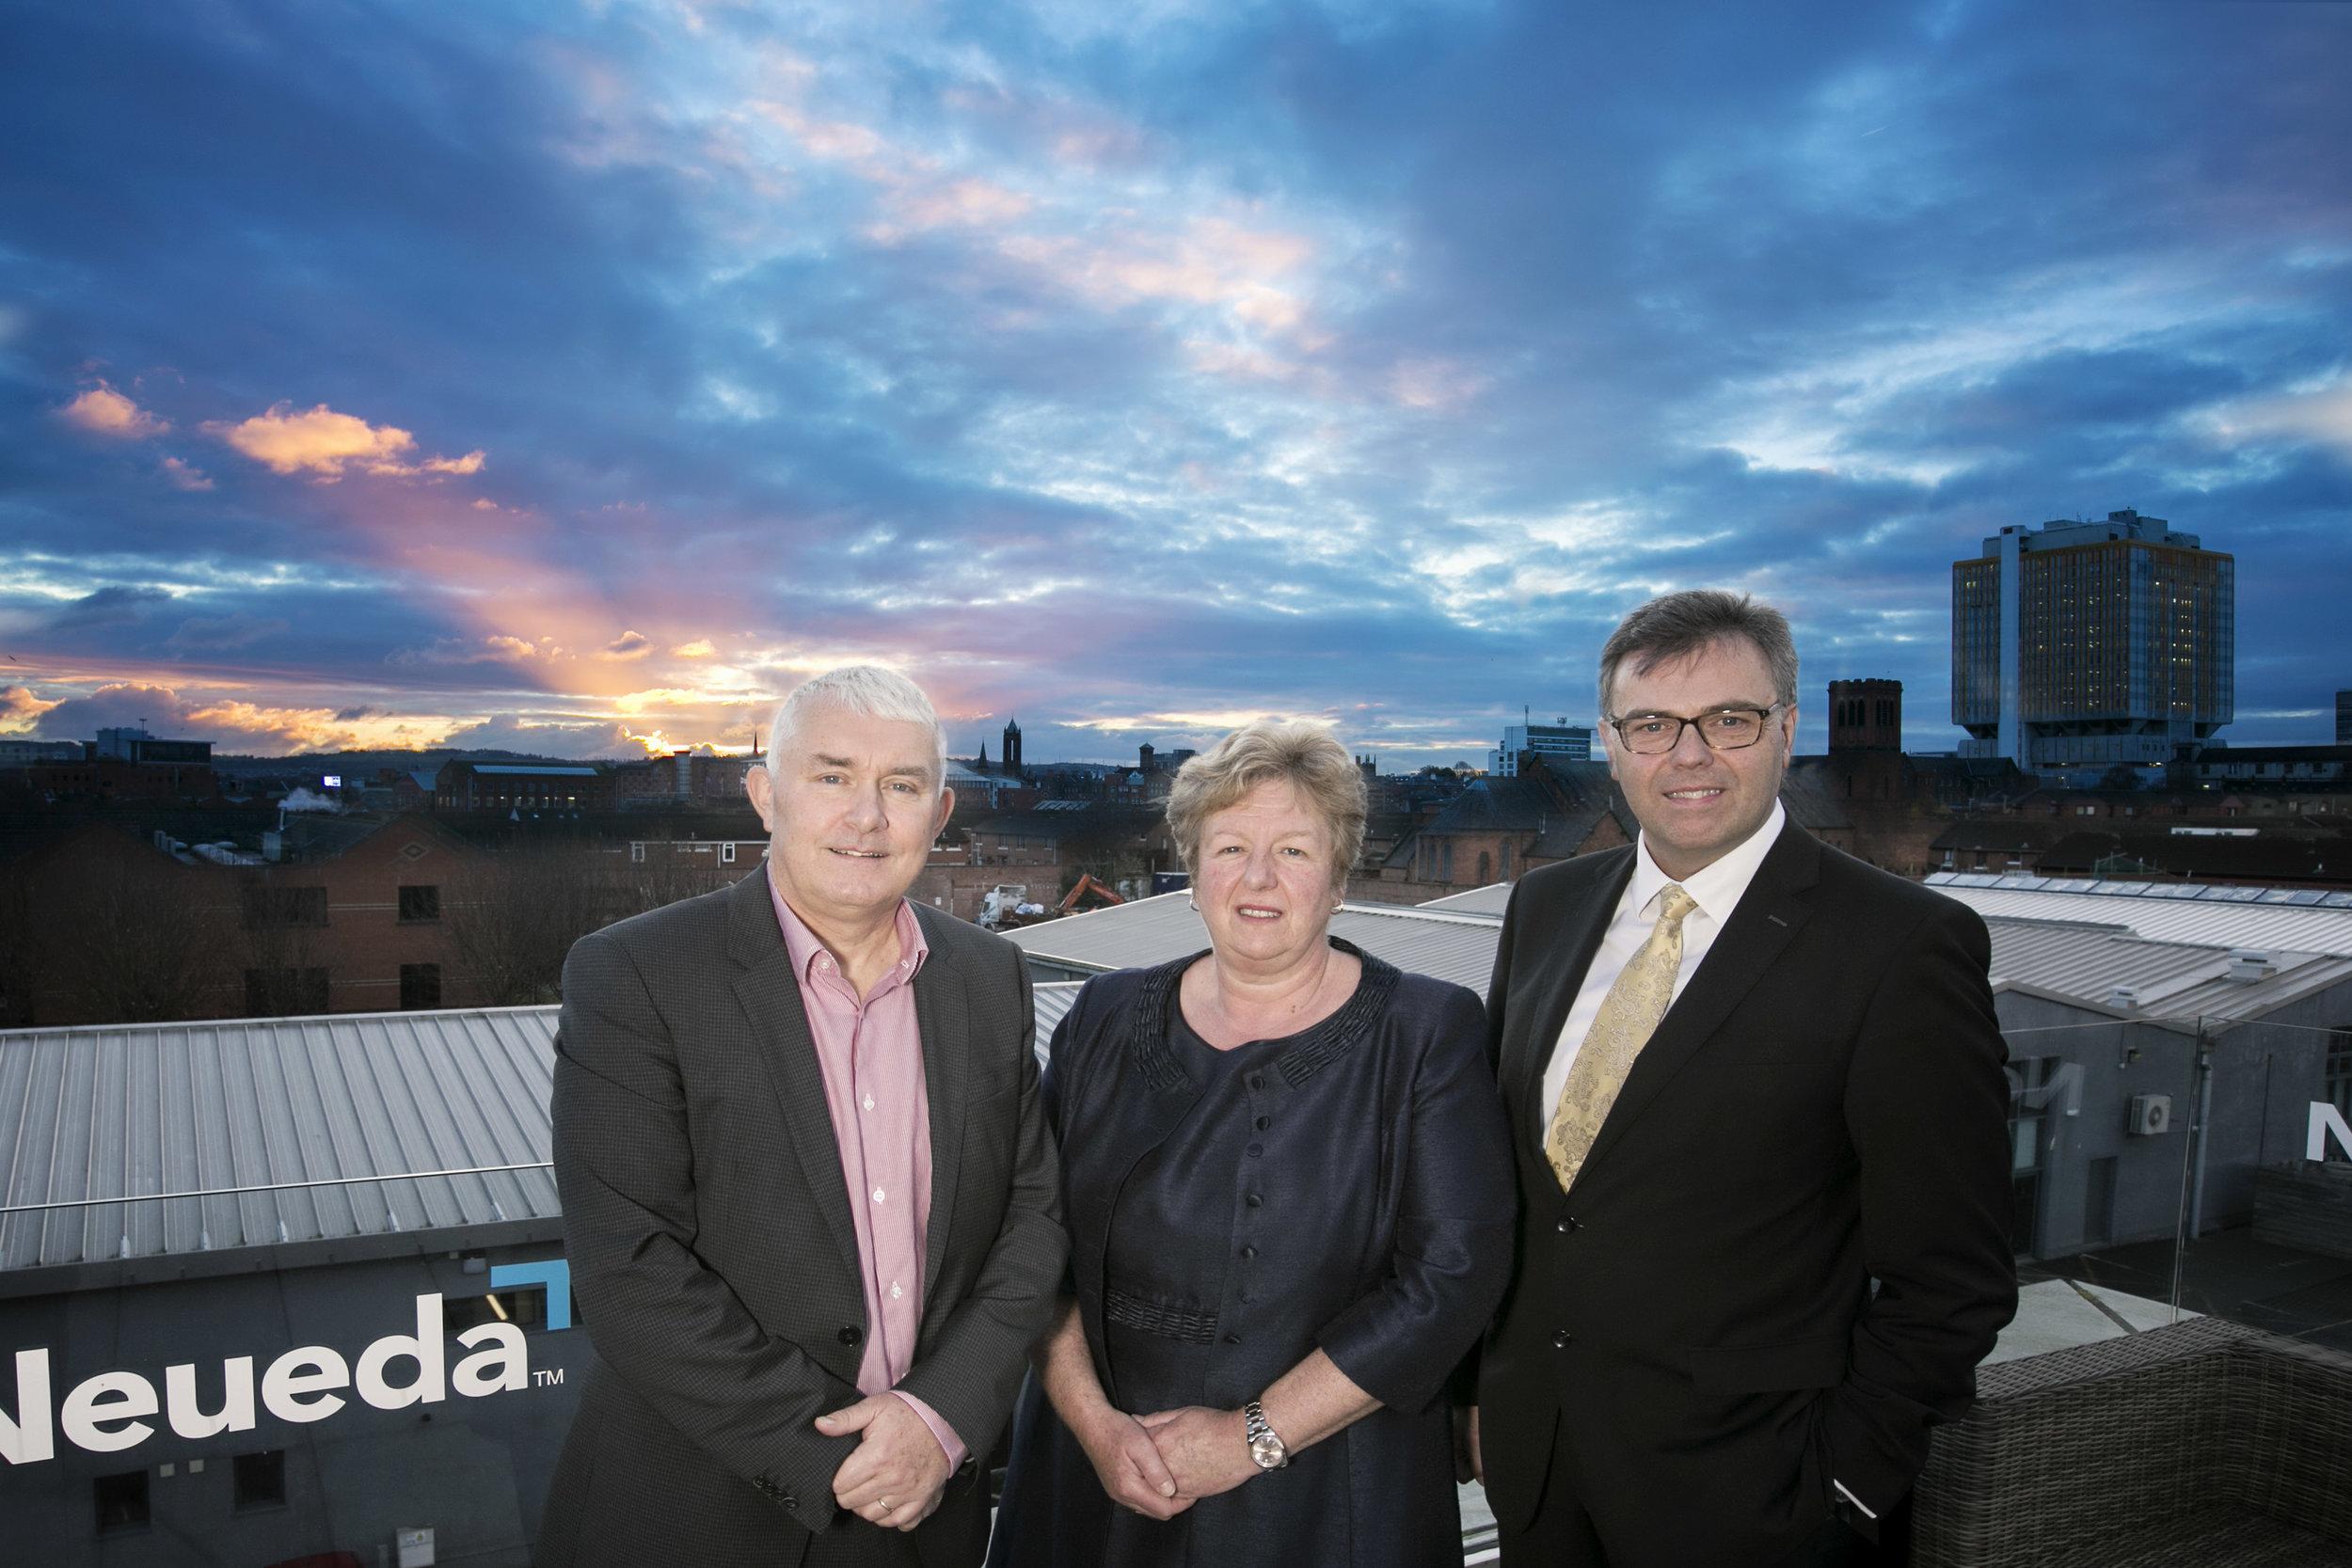 Brendan Monaghan, Neueda CEO with Helen Kirkpatrick, Neueda Chairman and Alastair Hamilton, Invest NI Chief Executive